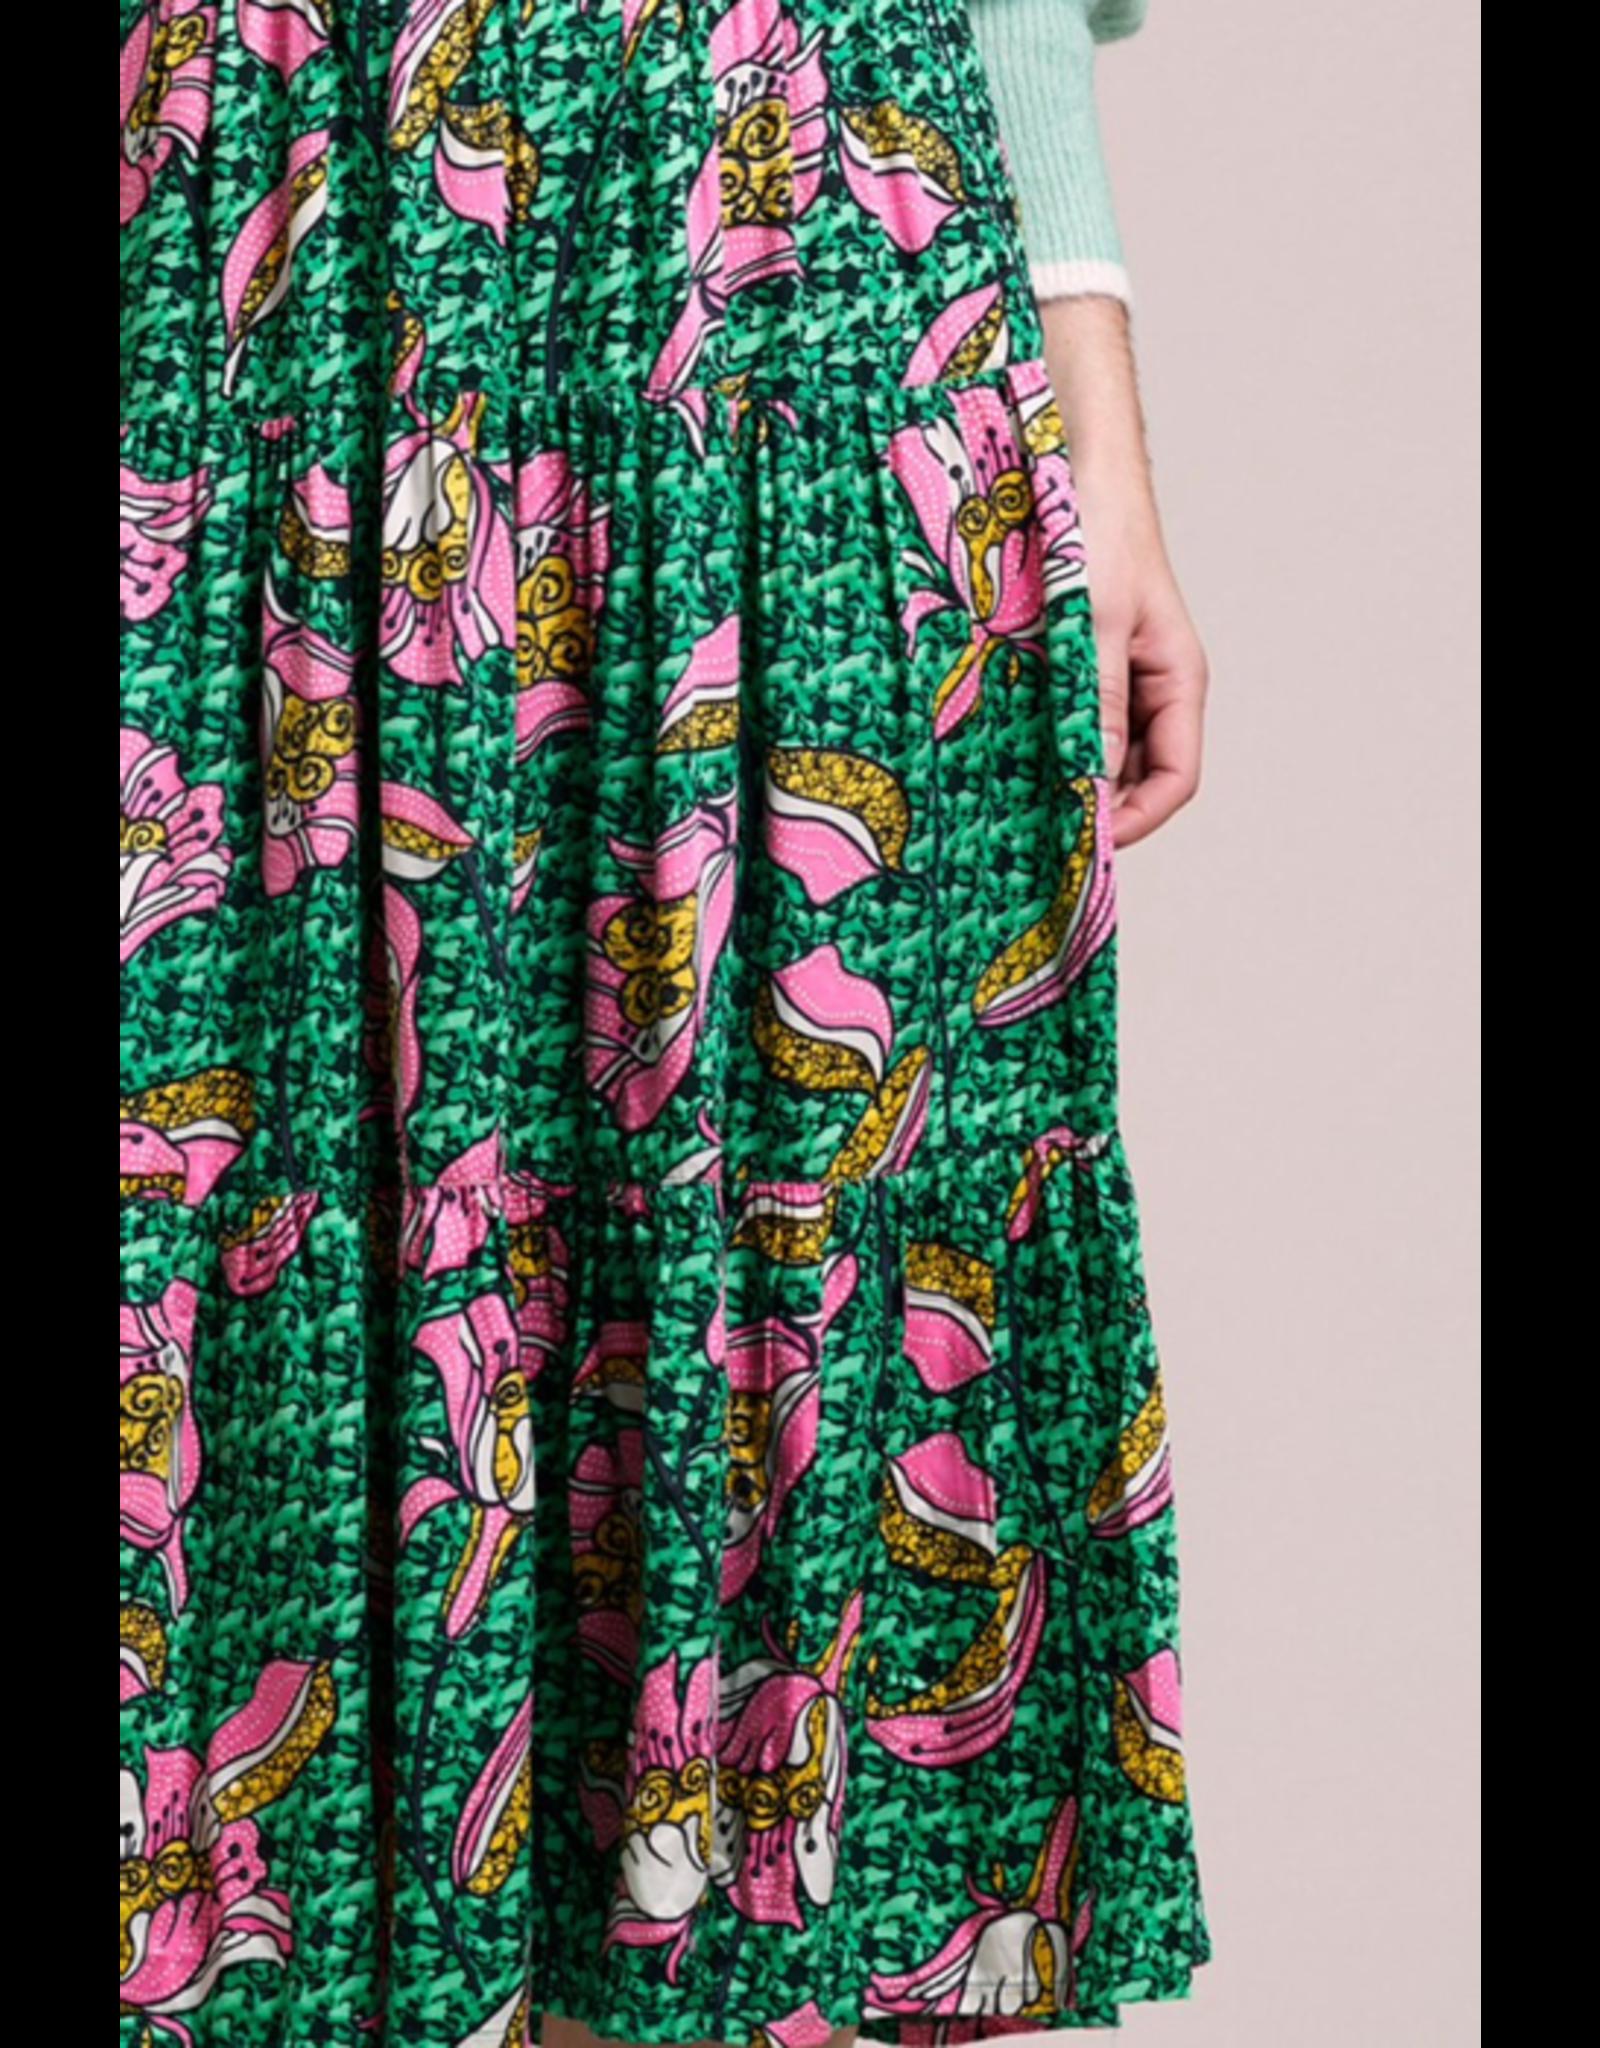 Lolly's Laundry Lolly's Laundry - Morning skirt